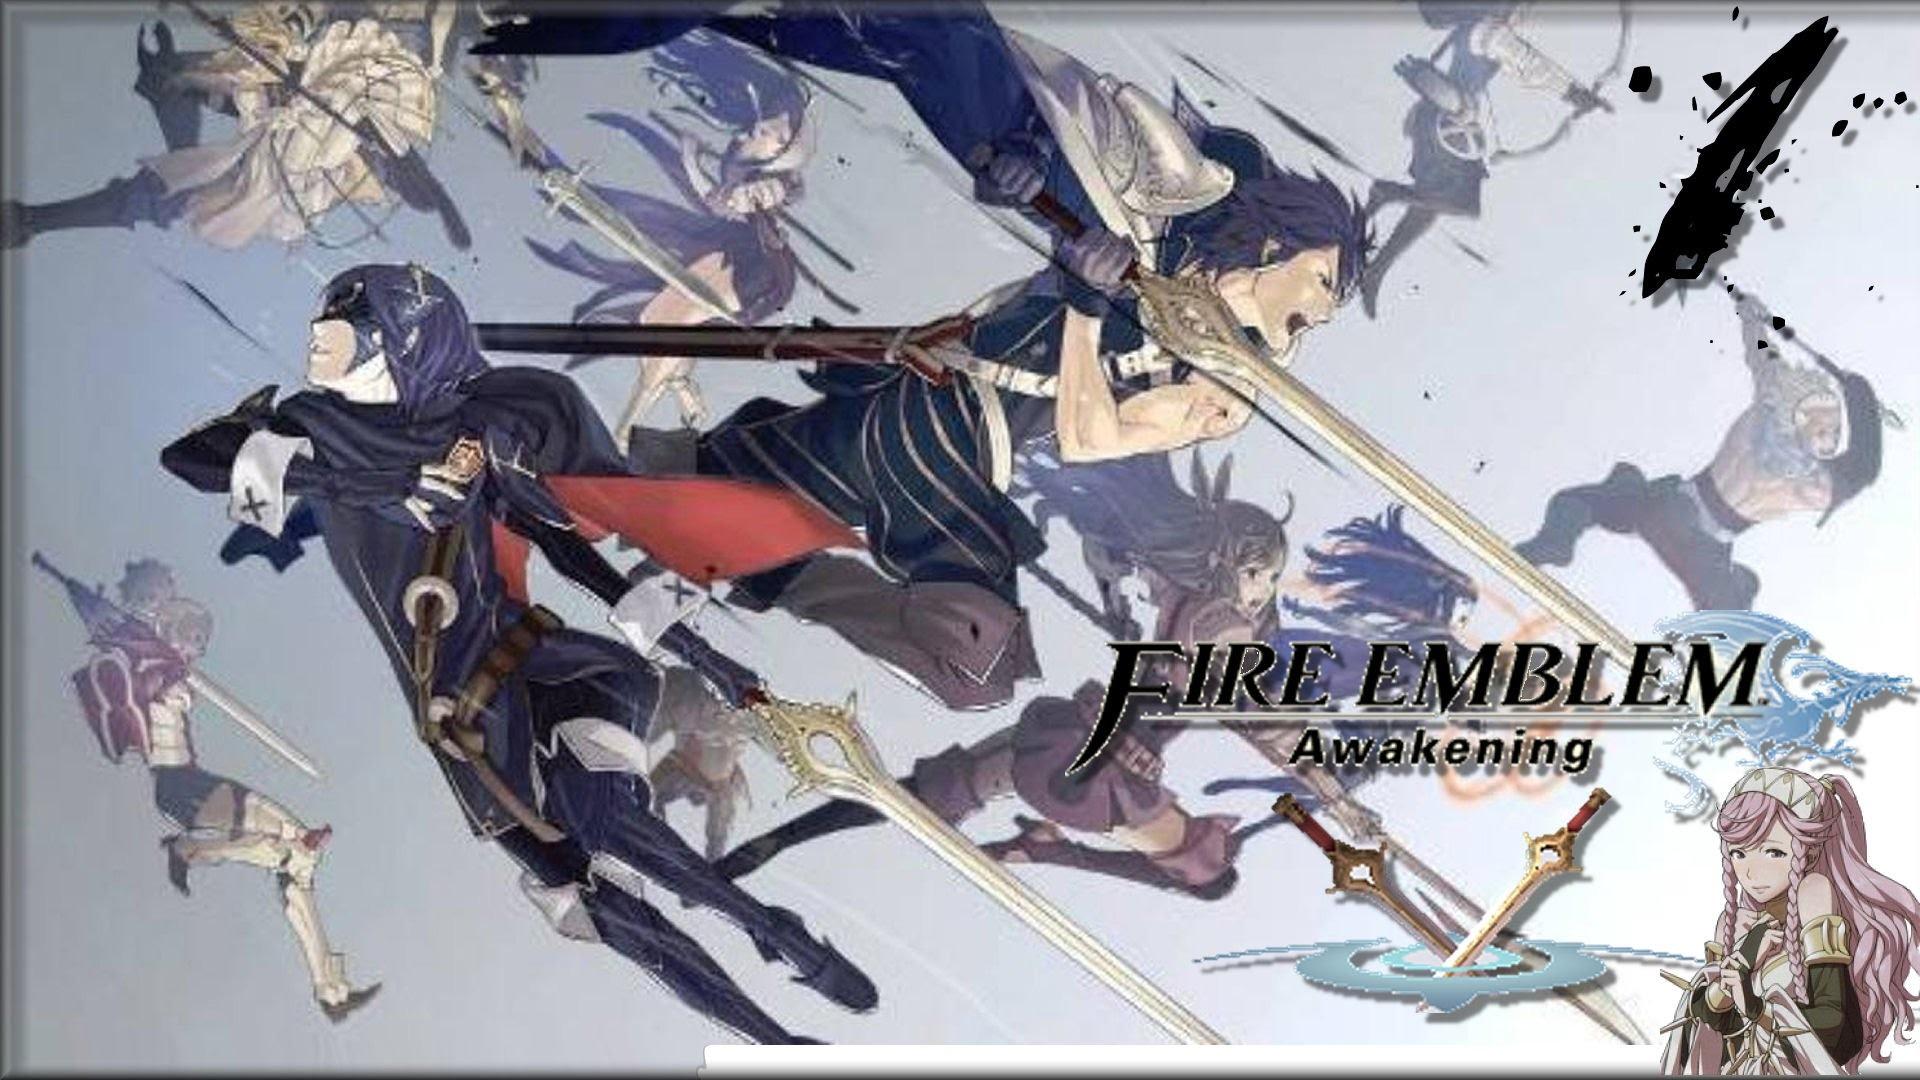 Fire Emblem Awakening wallpaper ·① Download free beautiful ...